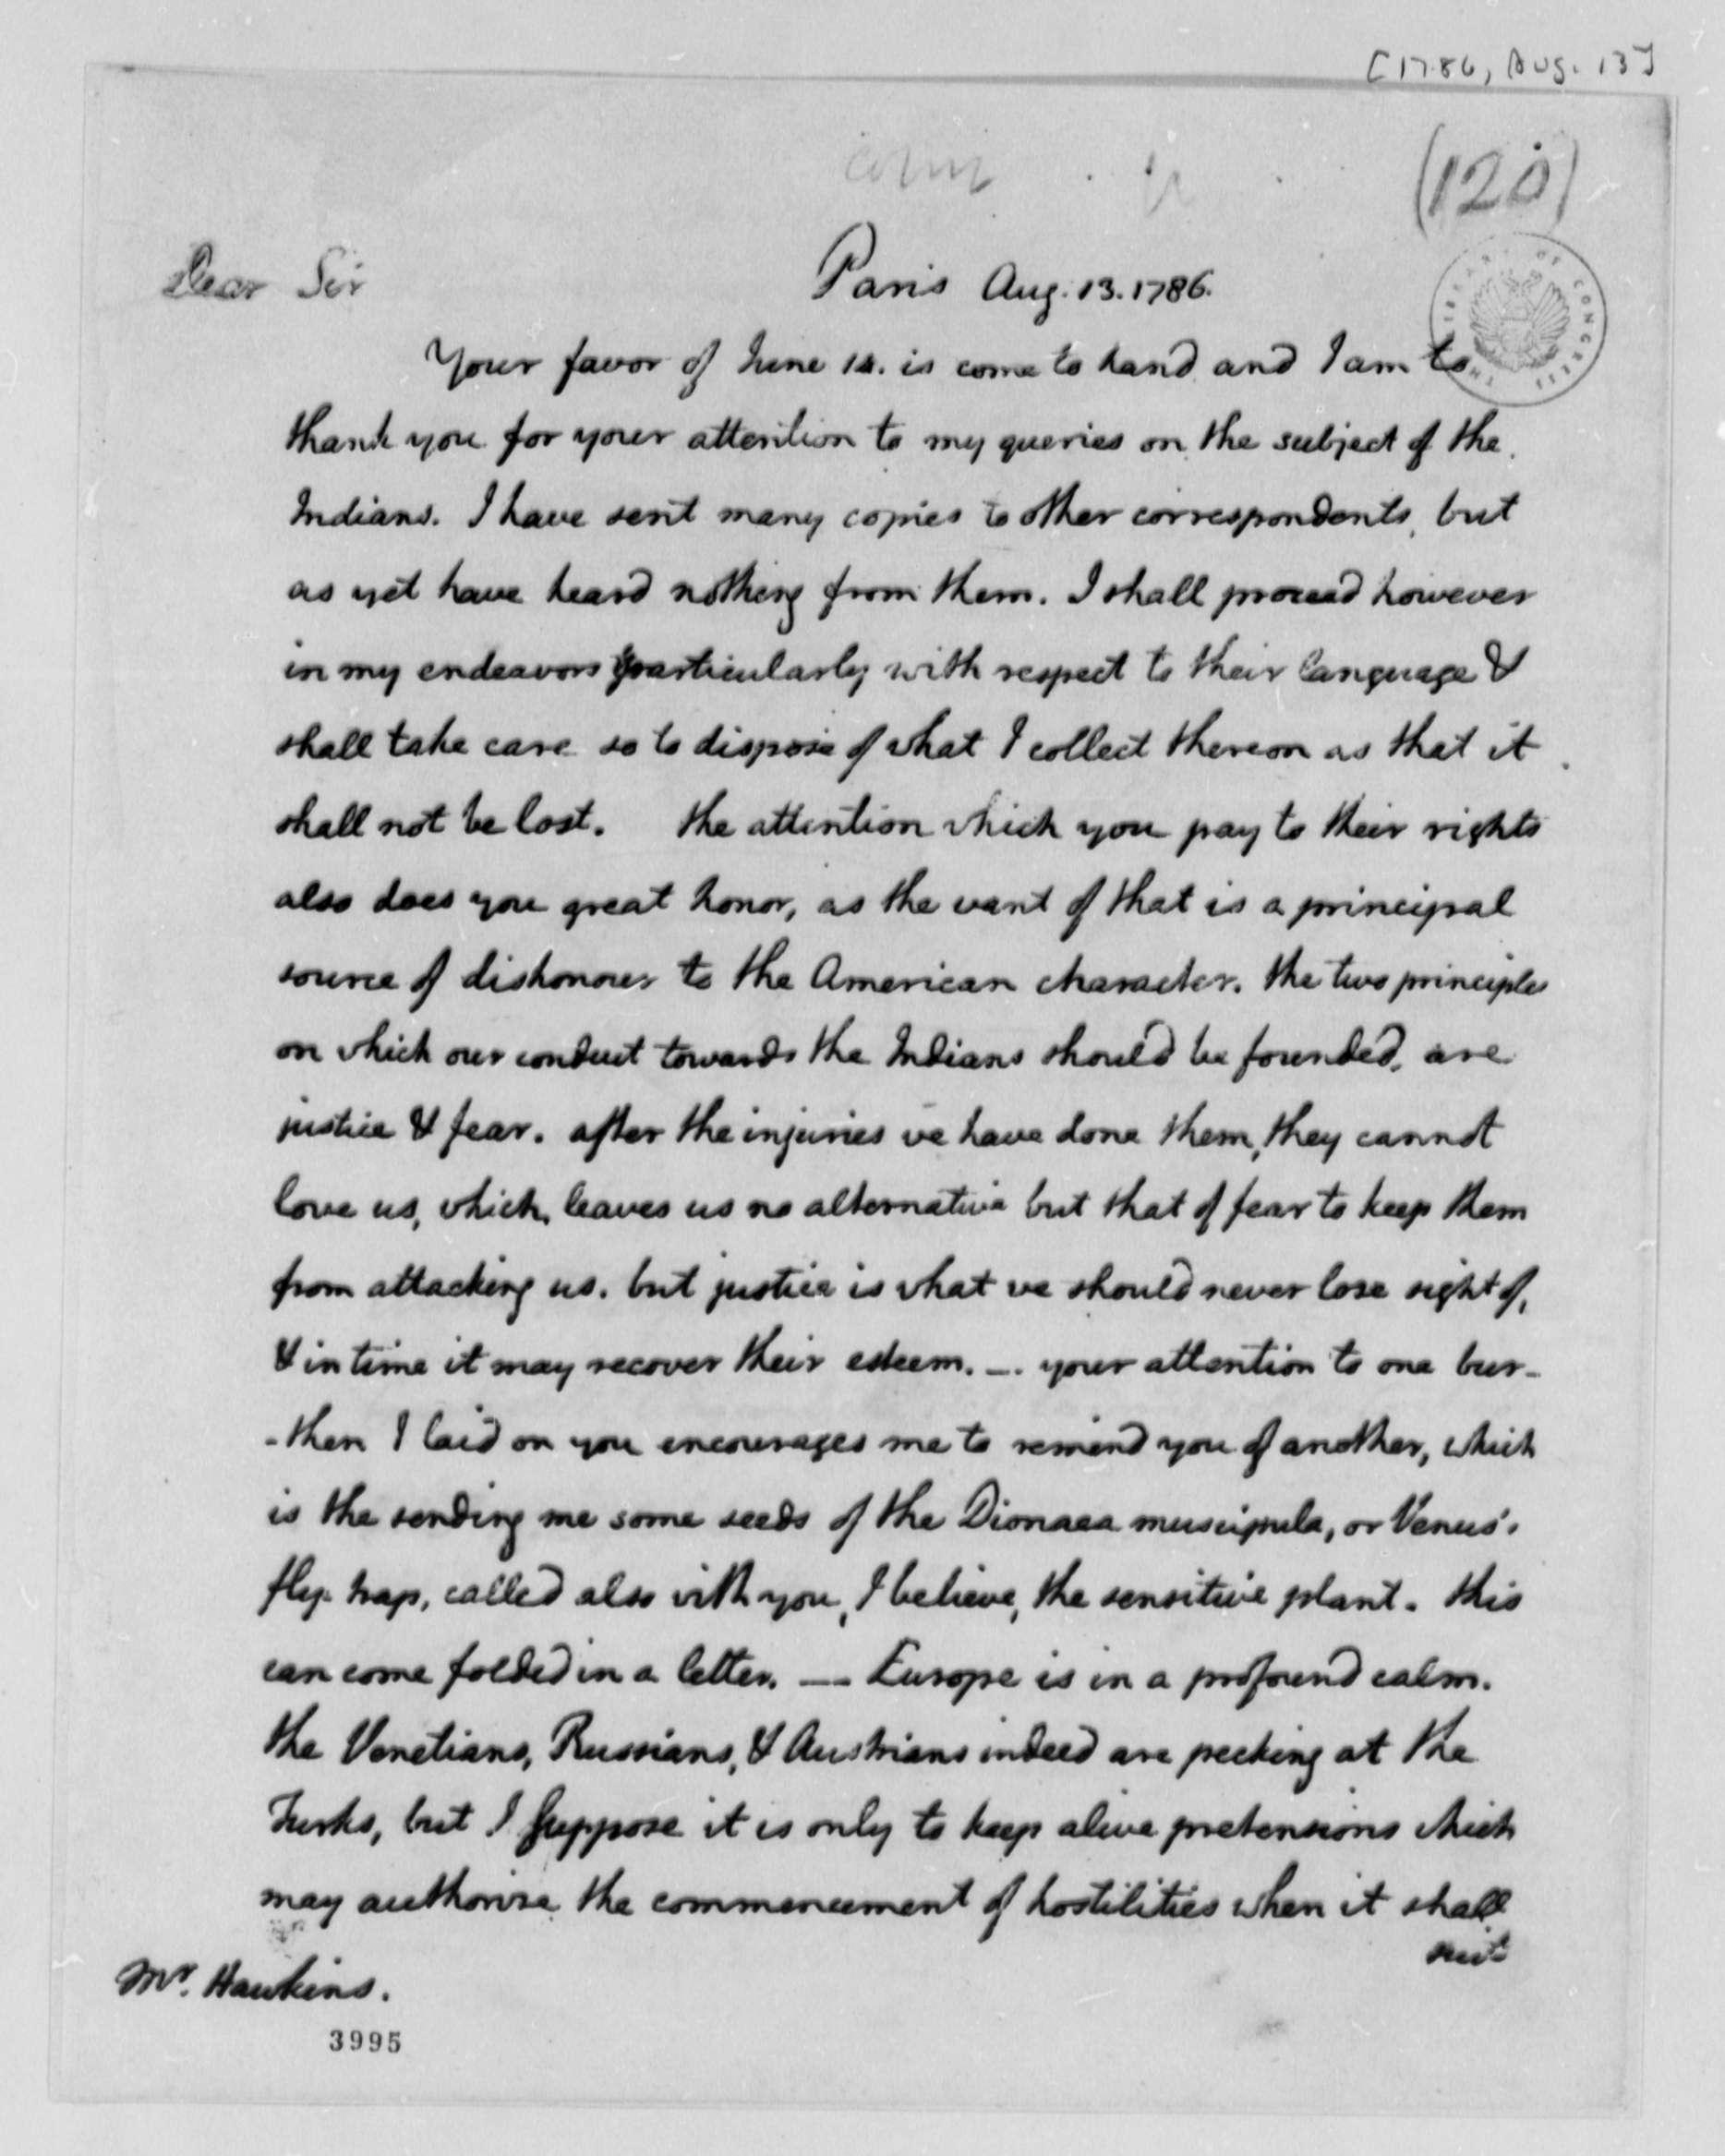 Thomas Jefferson on Native Americans